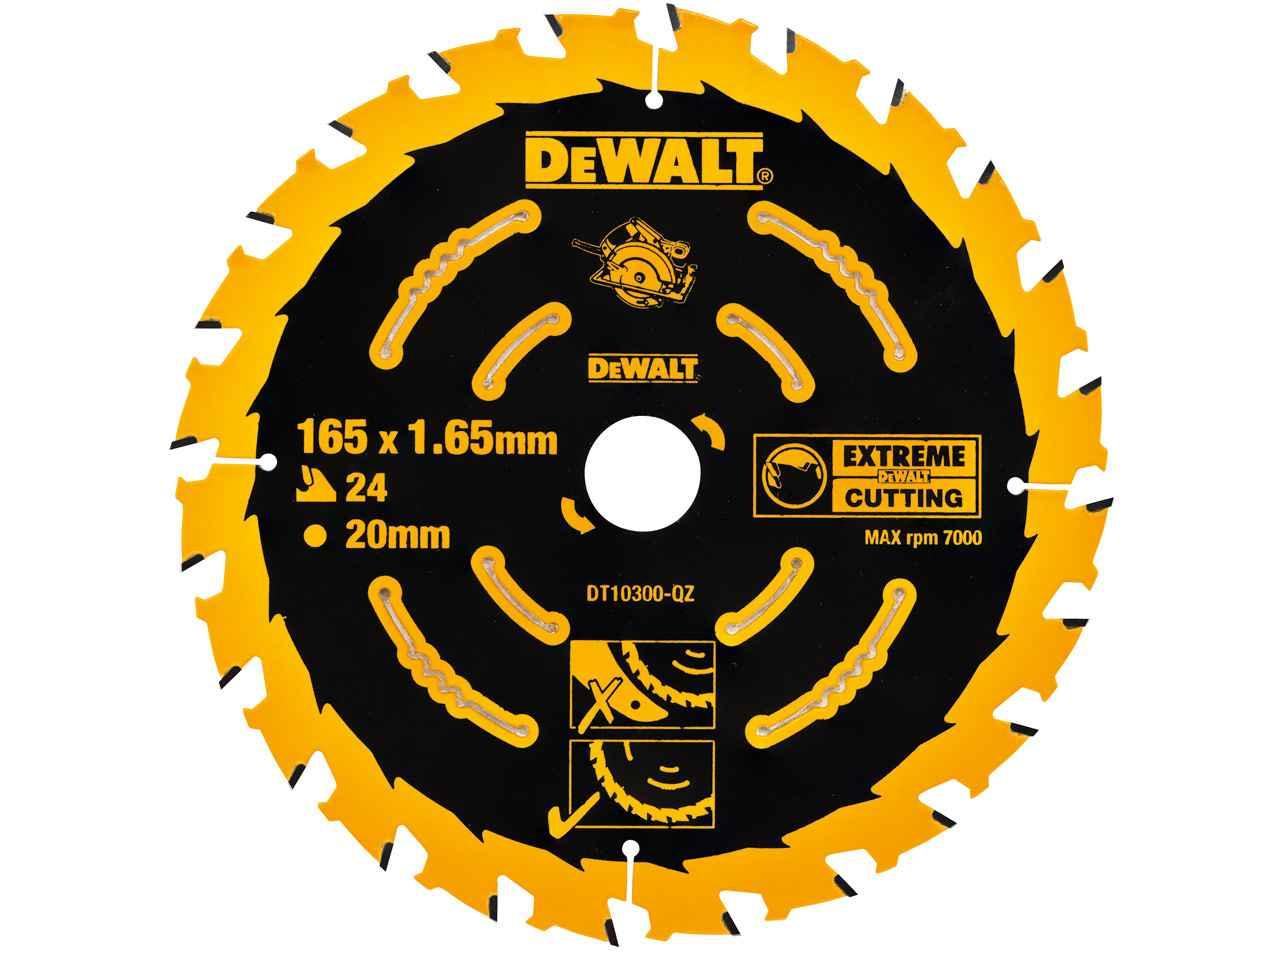 Dewalt_DT10300QZ.jpg